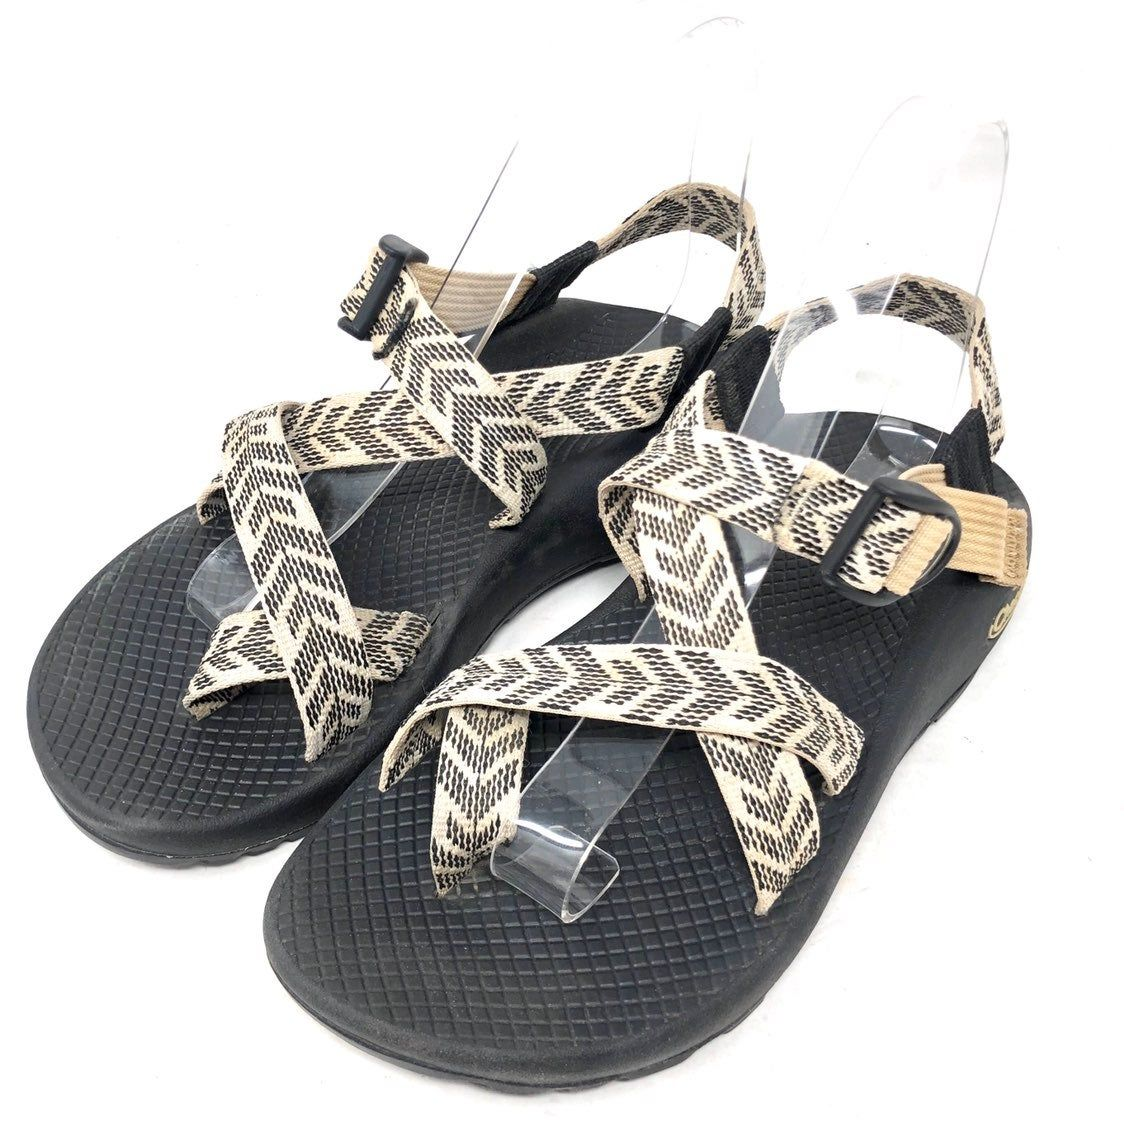 Chaco z2 classic black white chevron toe loop sports